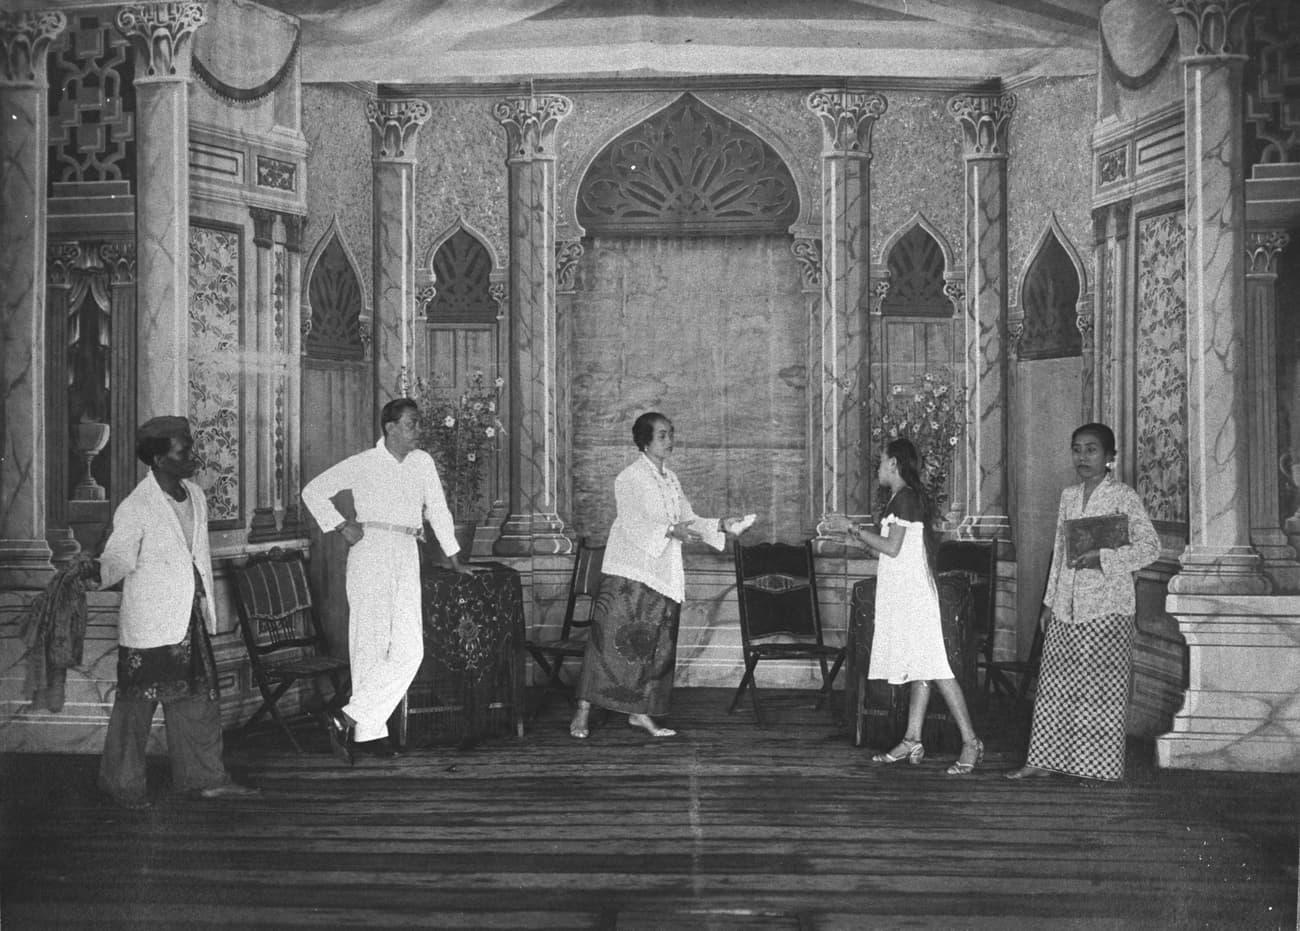 Bangsawan opera, 1930s